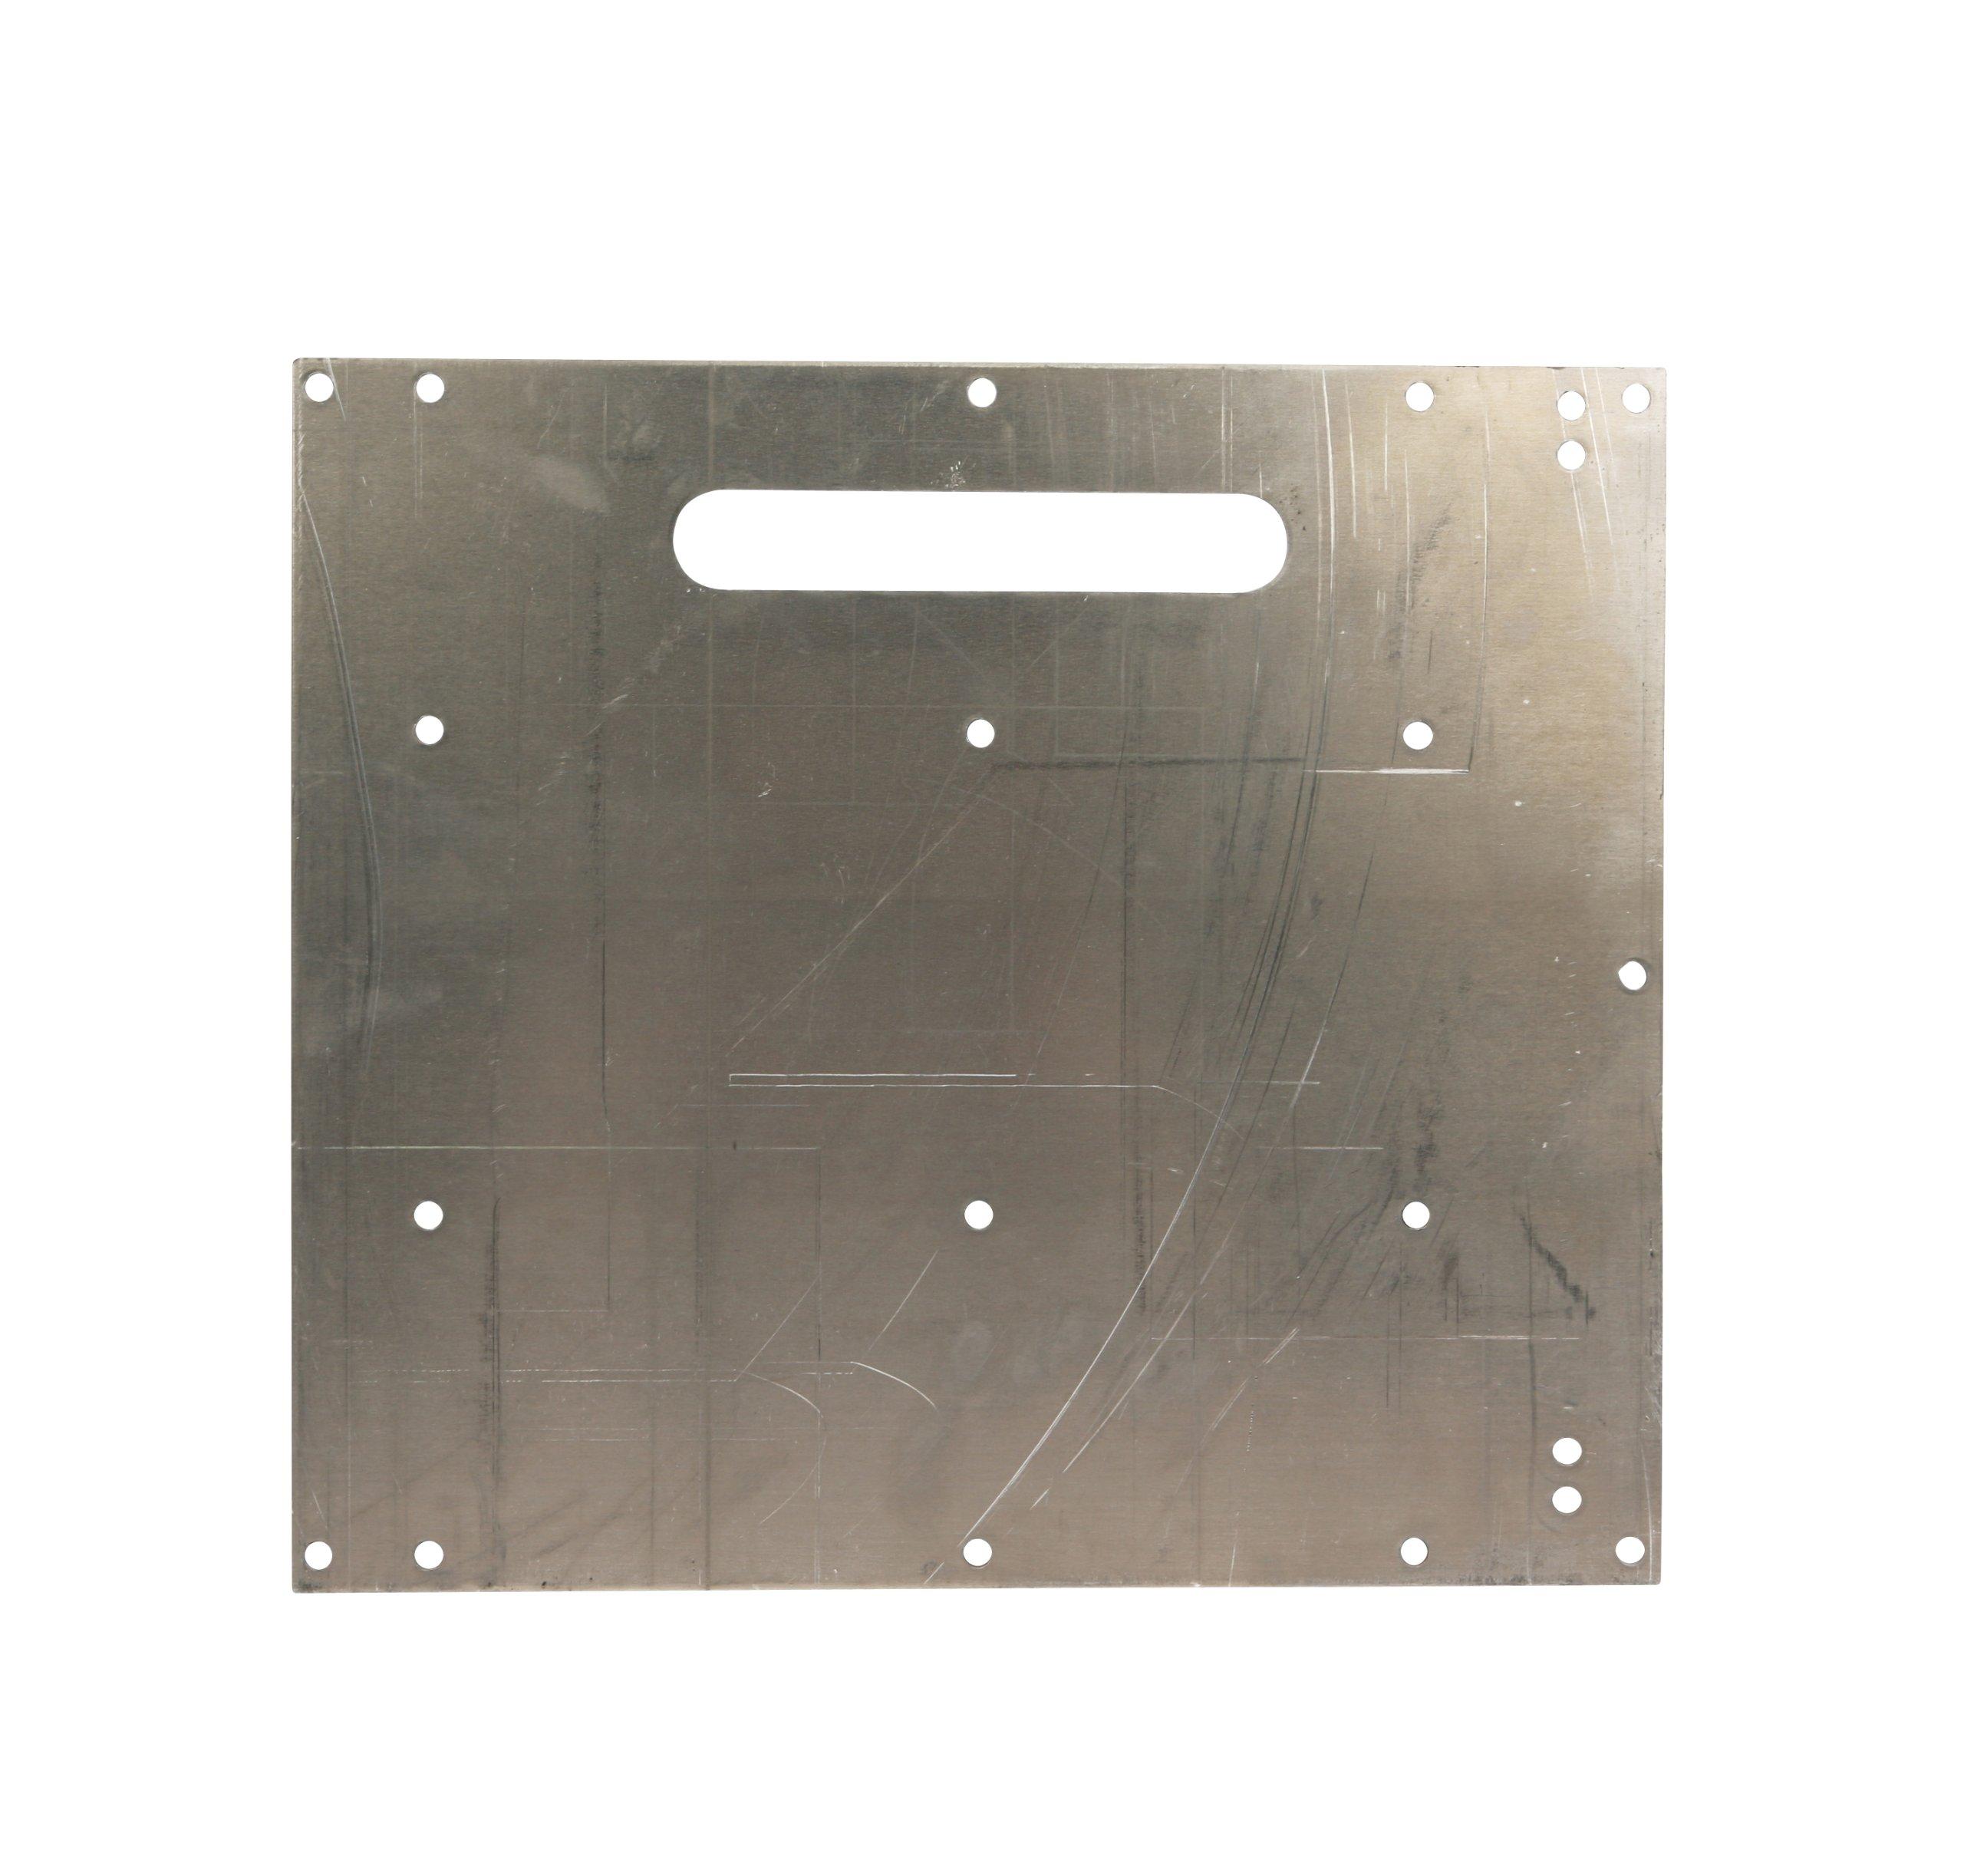 APW WYOTT 84139 (S) Aluminum Transfer Plate